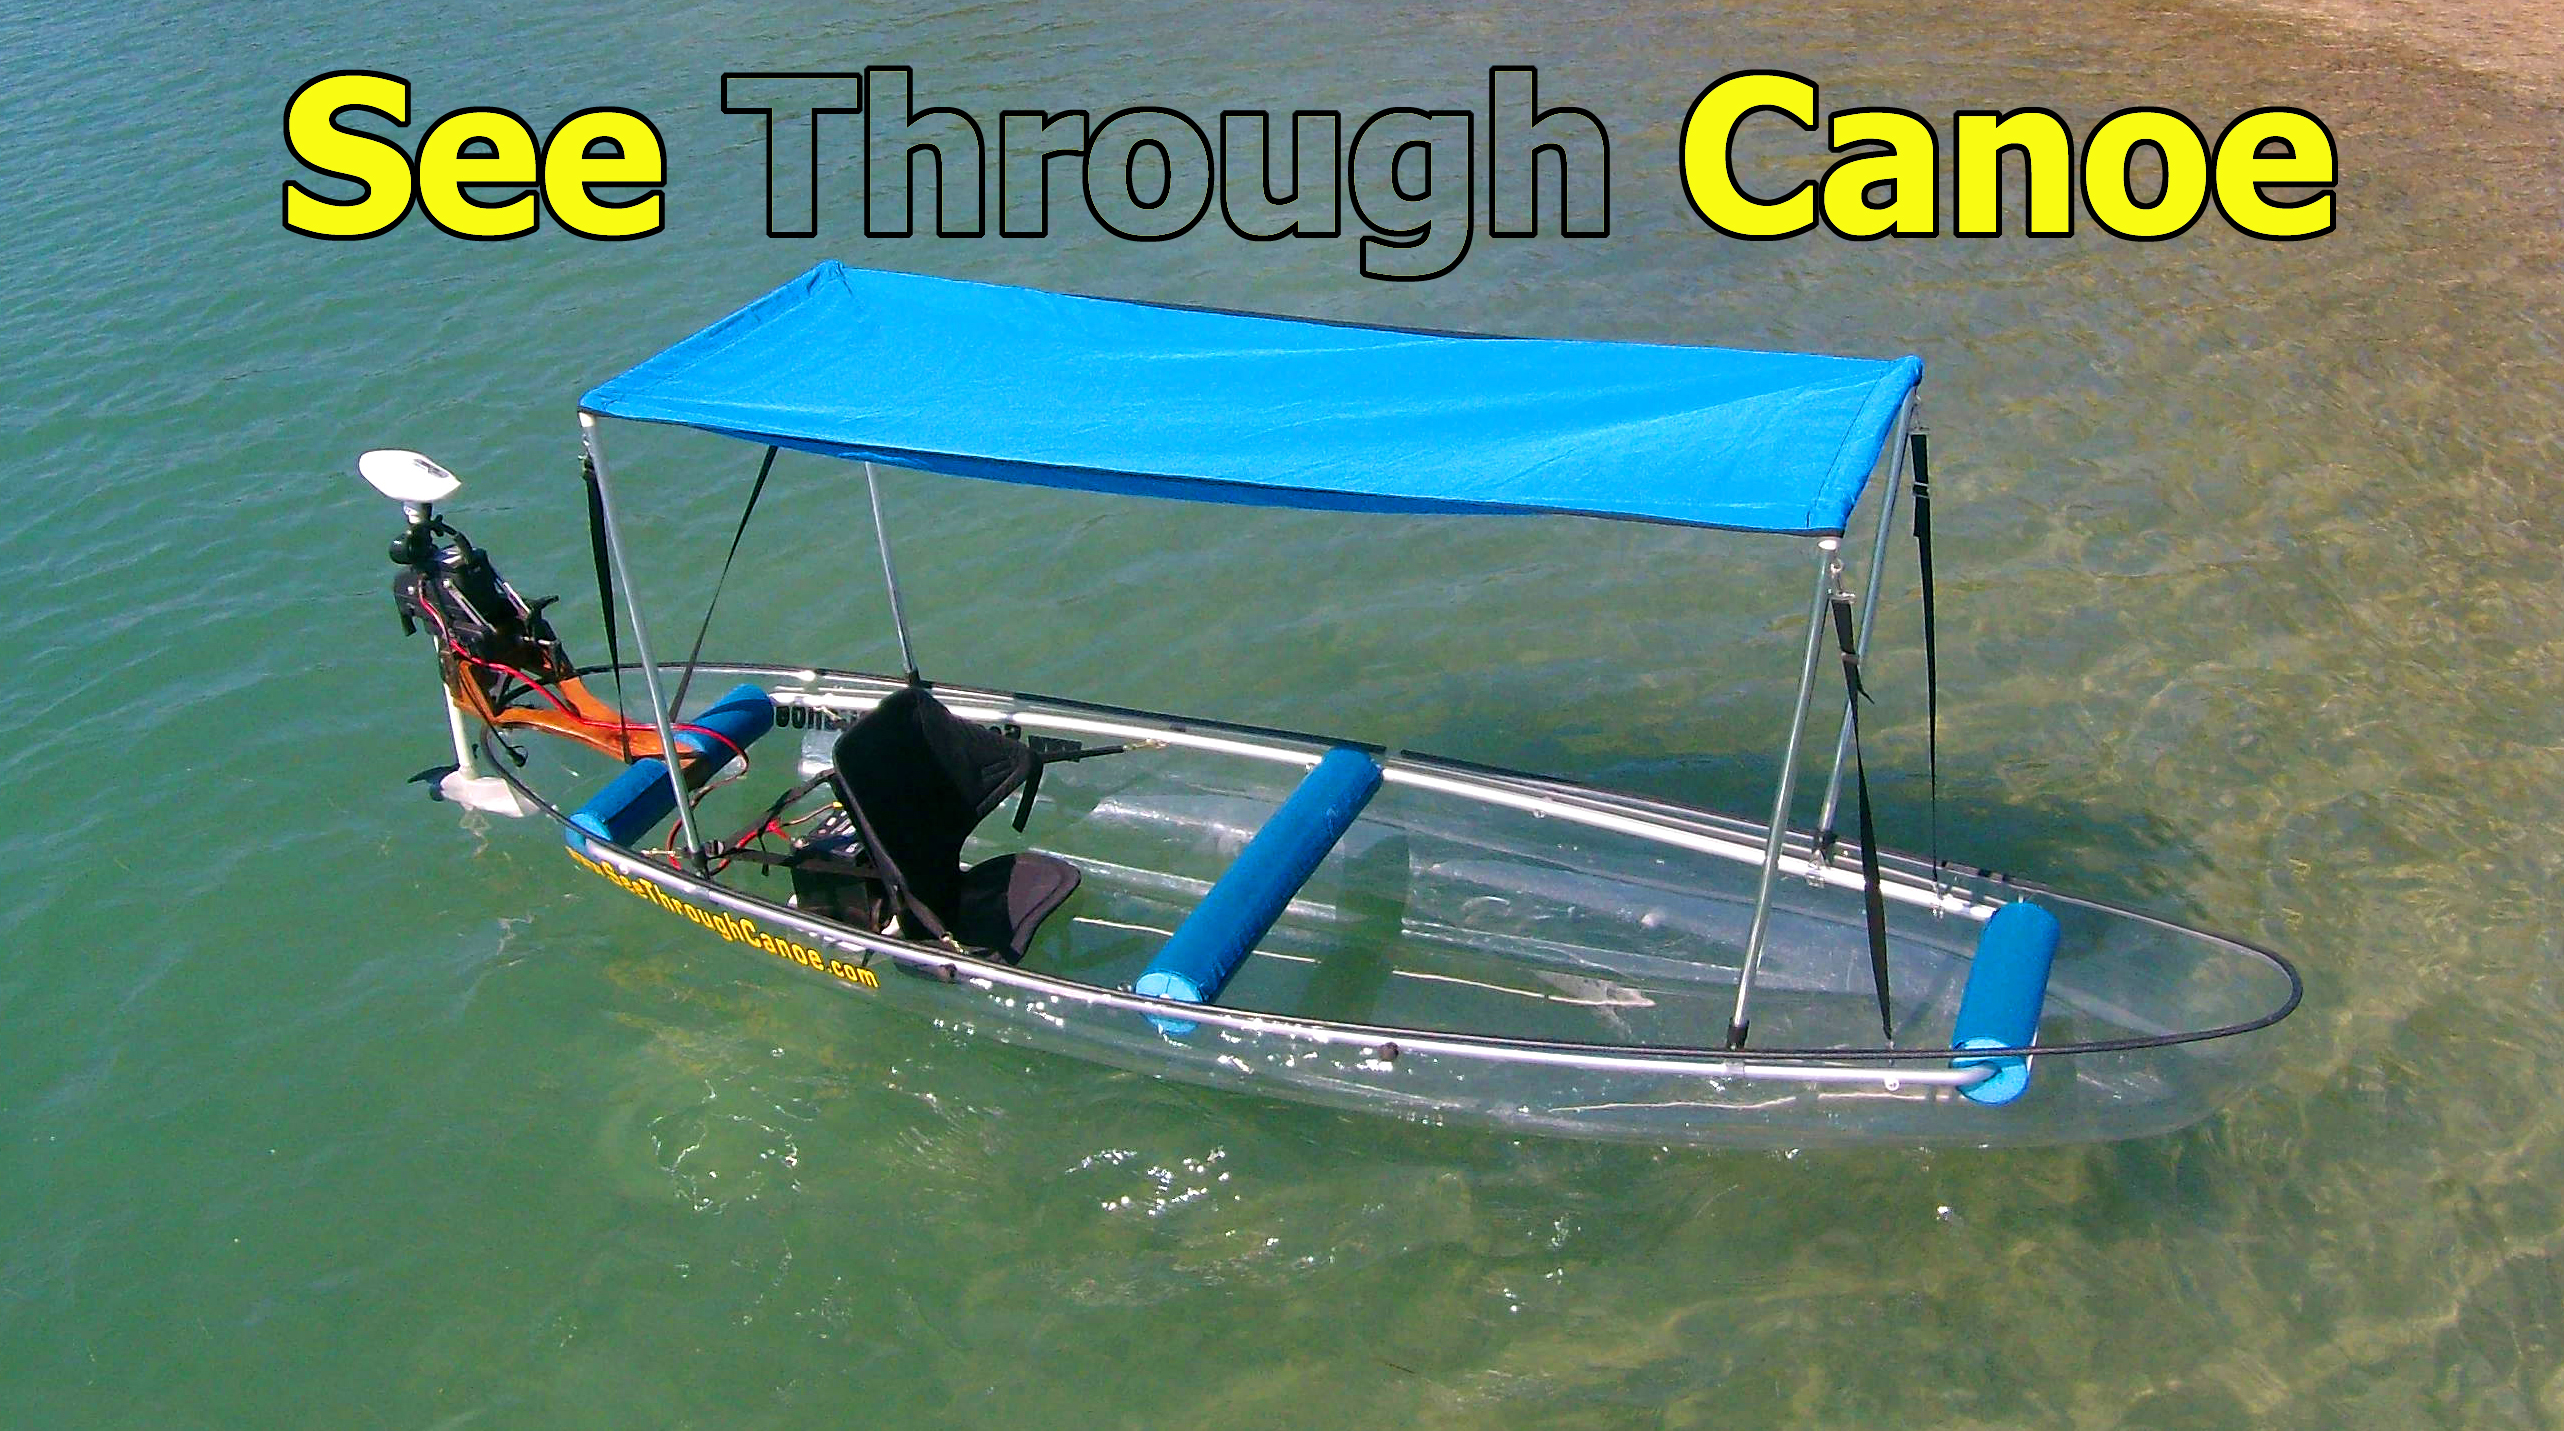 Canoe with motor on it